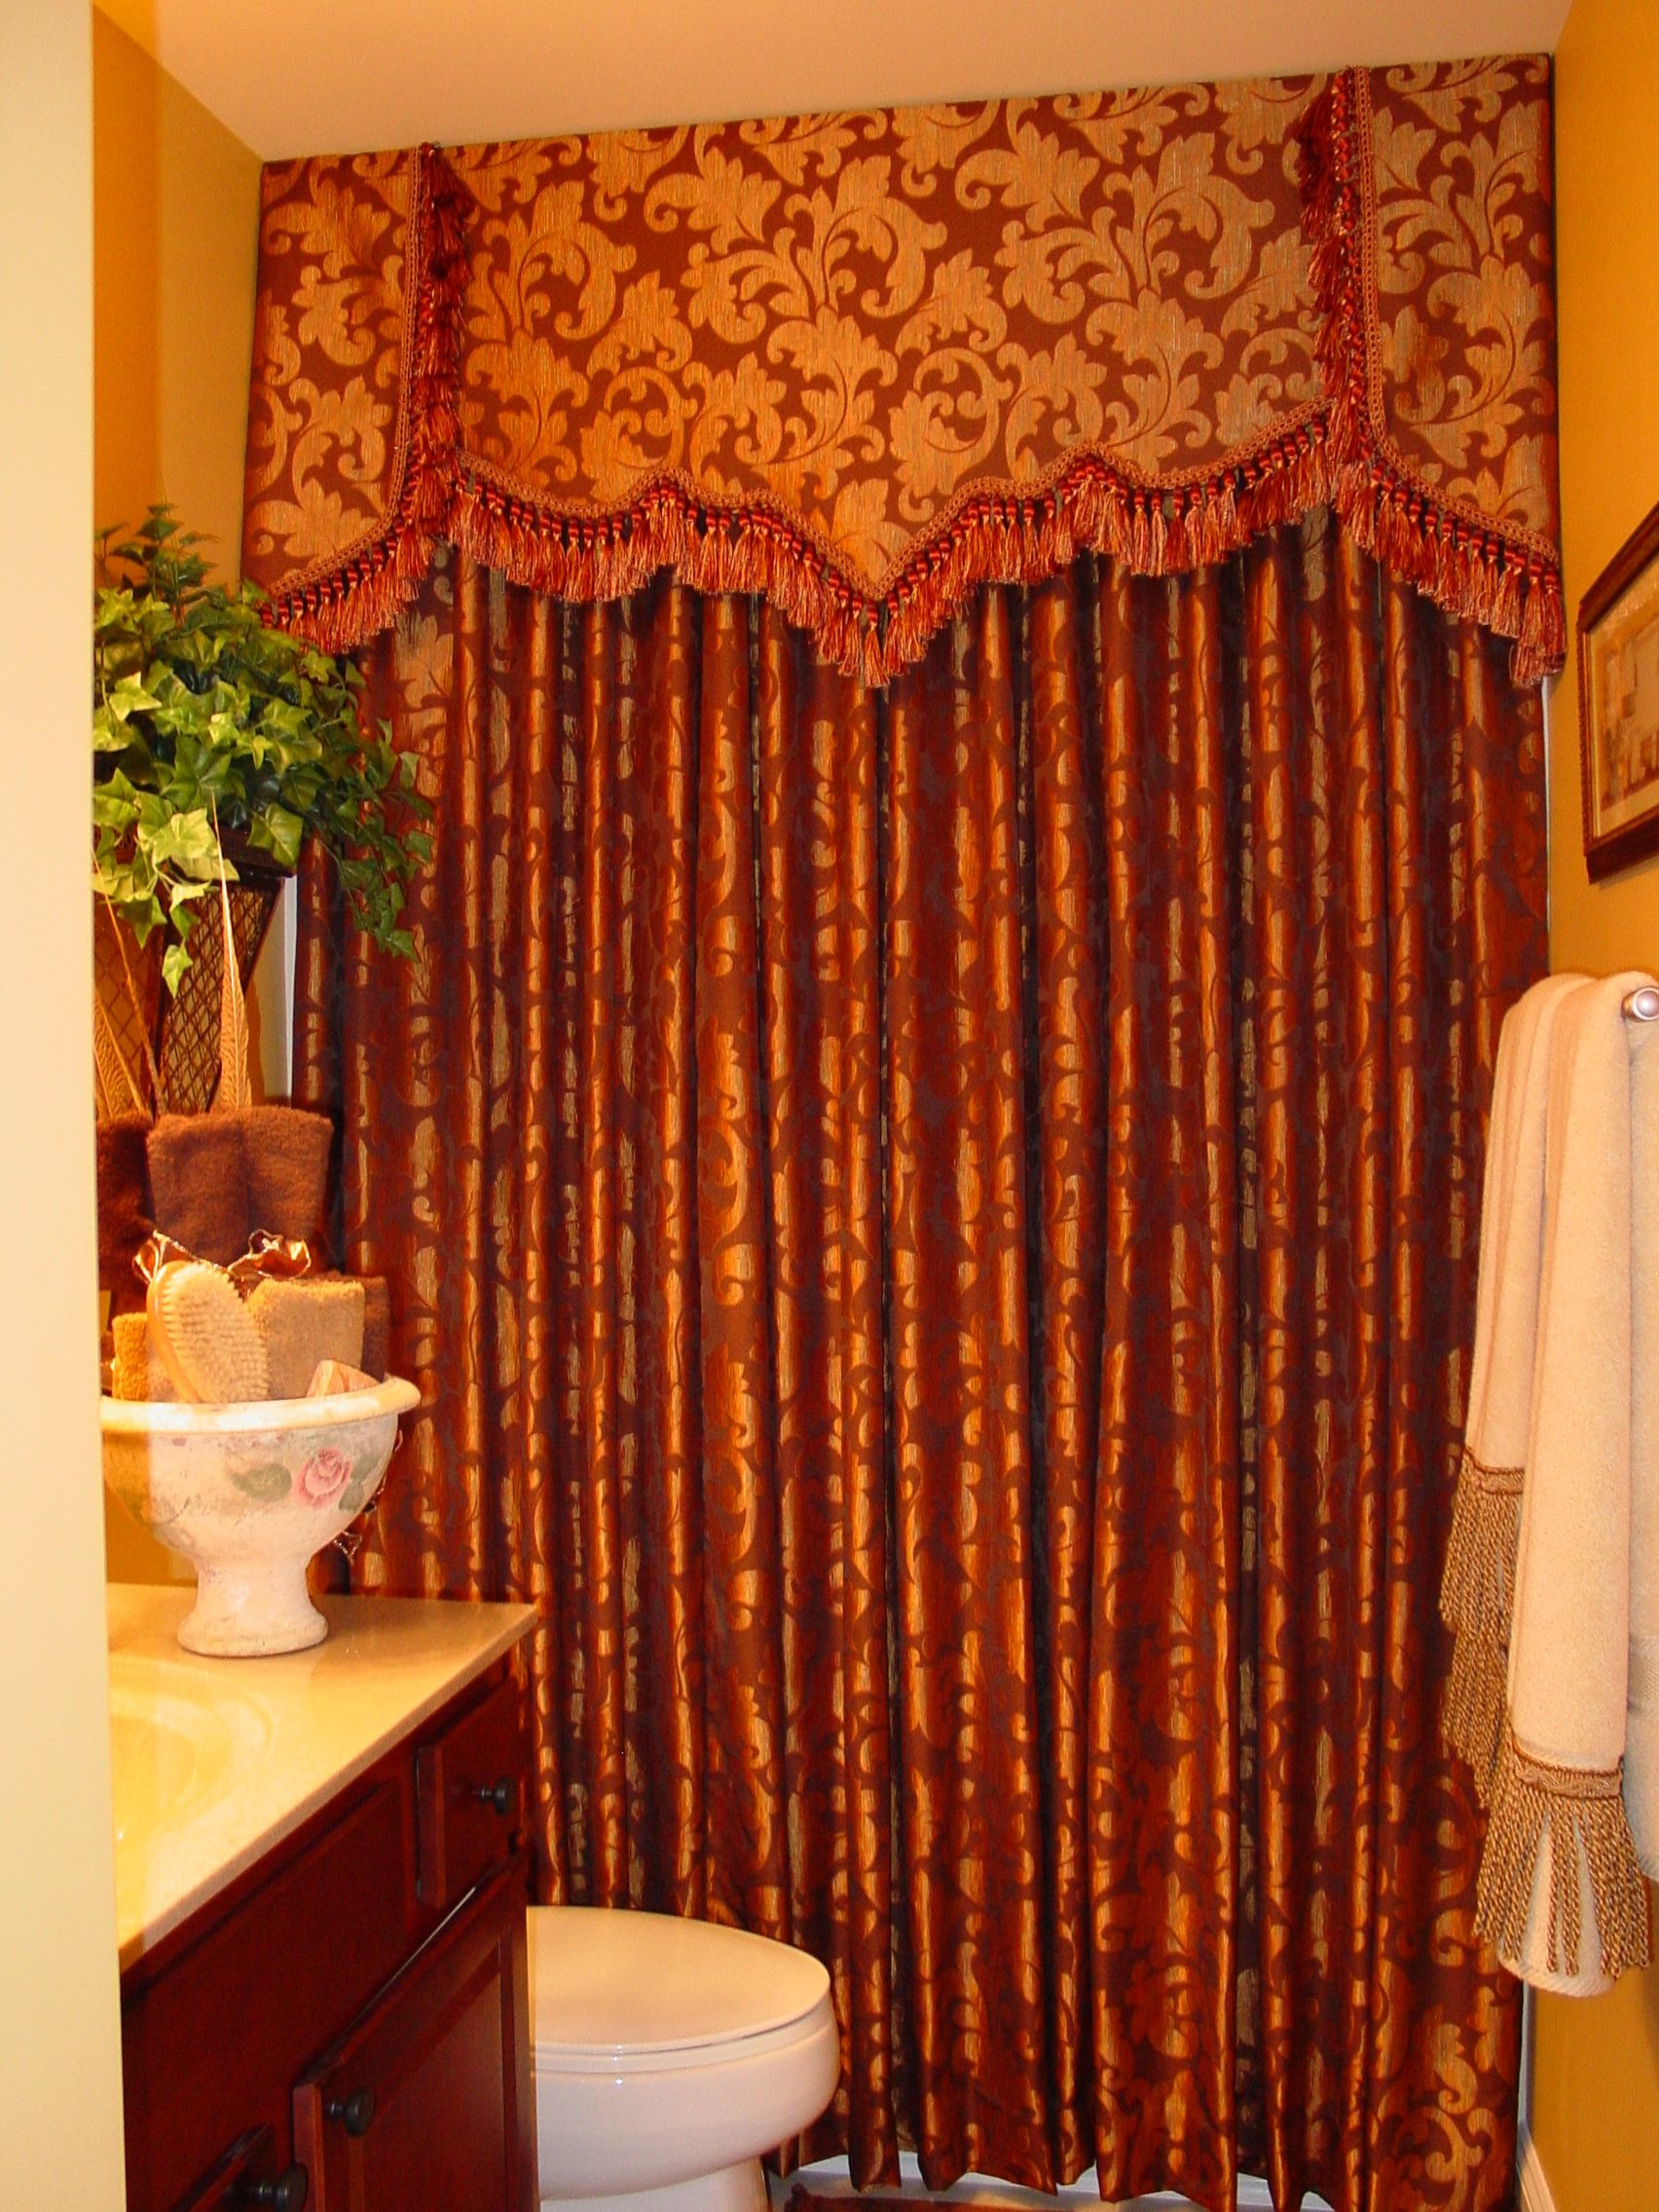 Custom Shower Curtain  Dianas Blinds  Designs jobs my